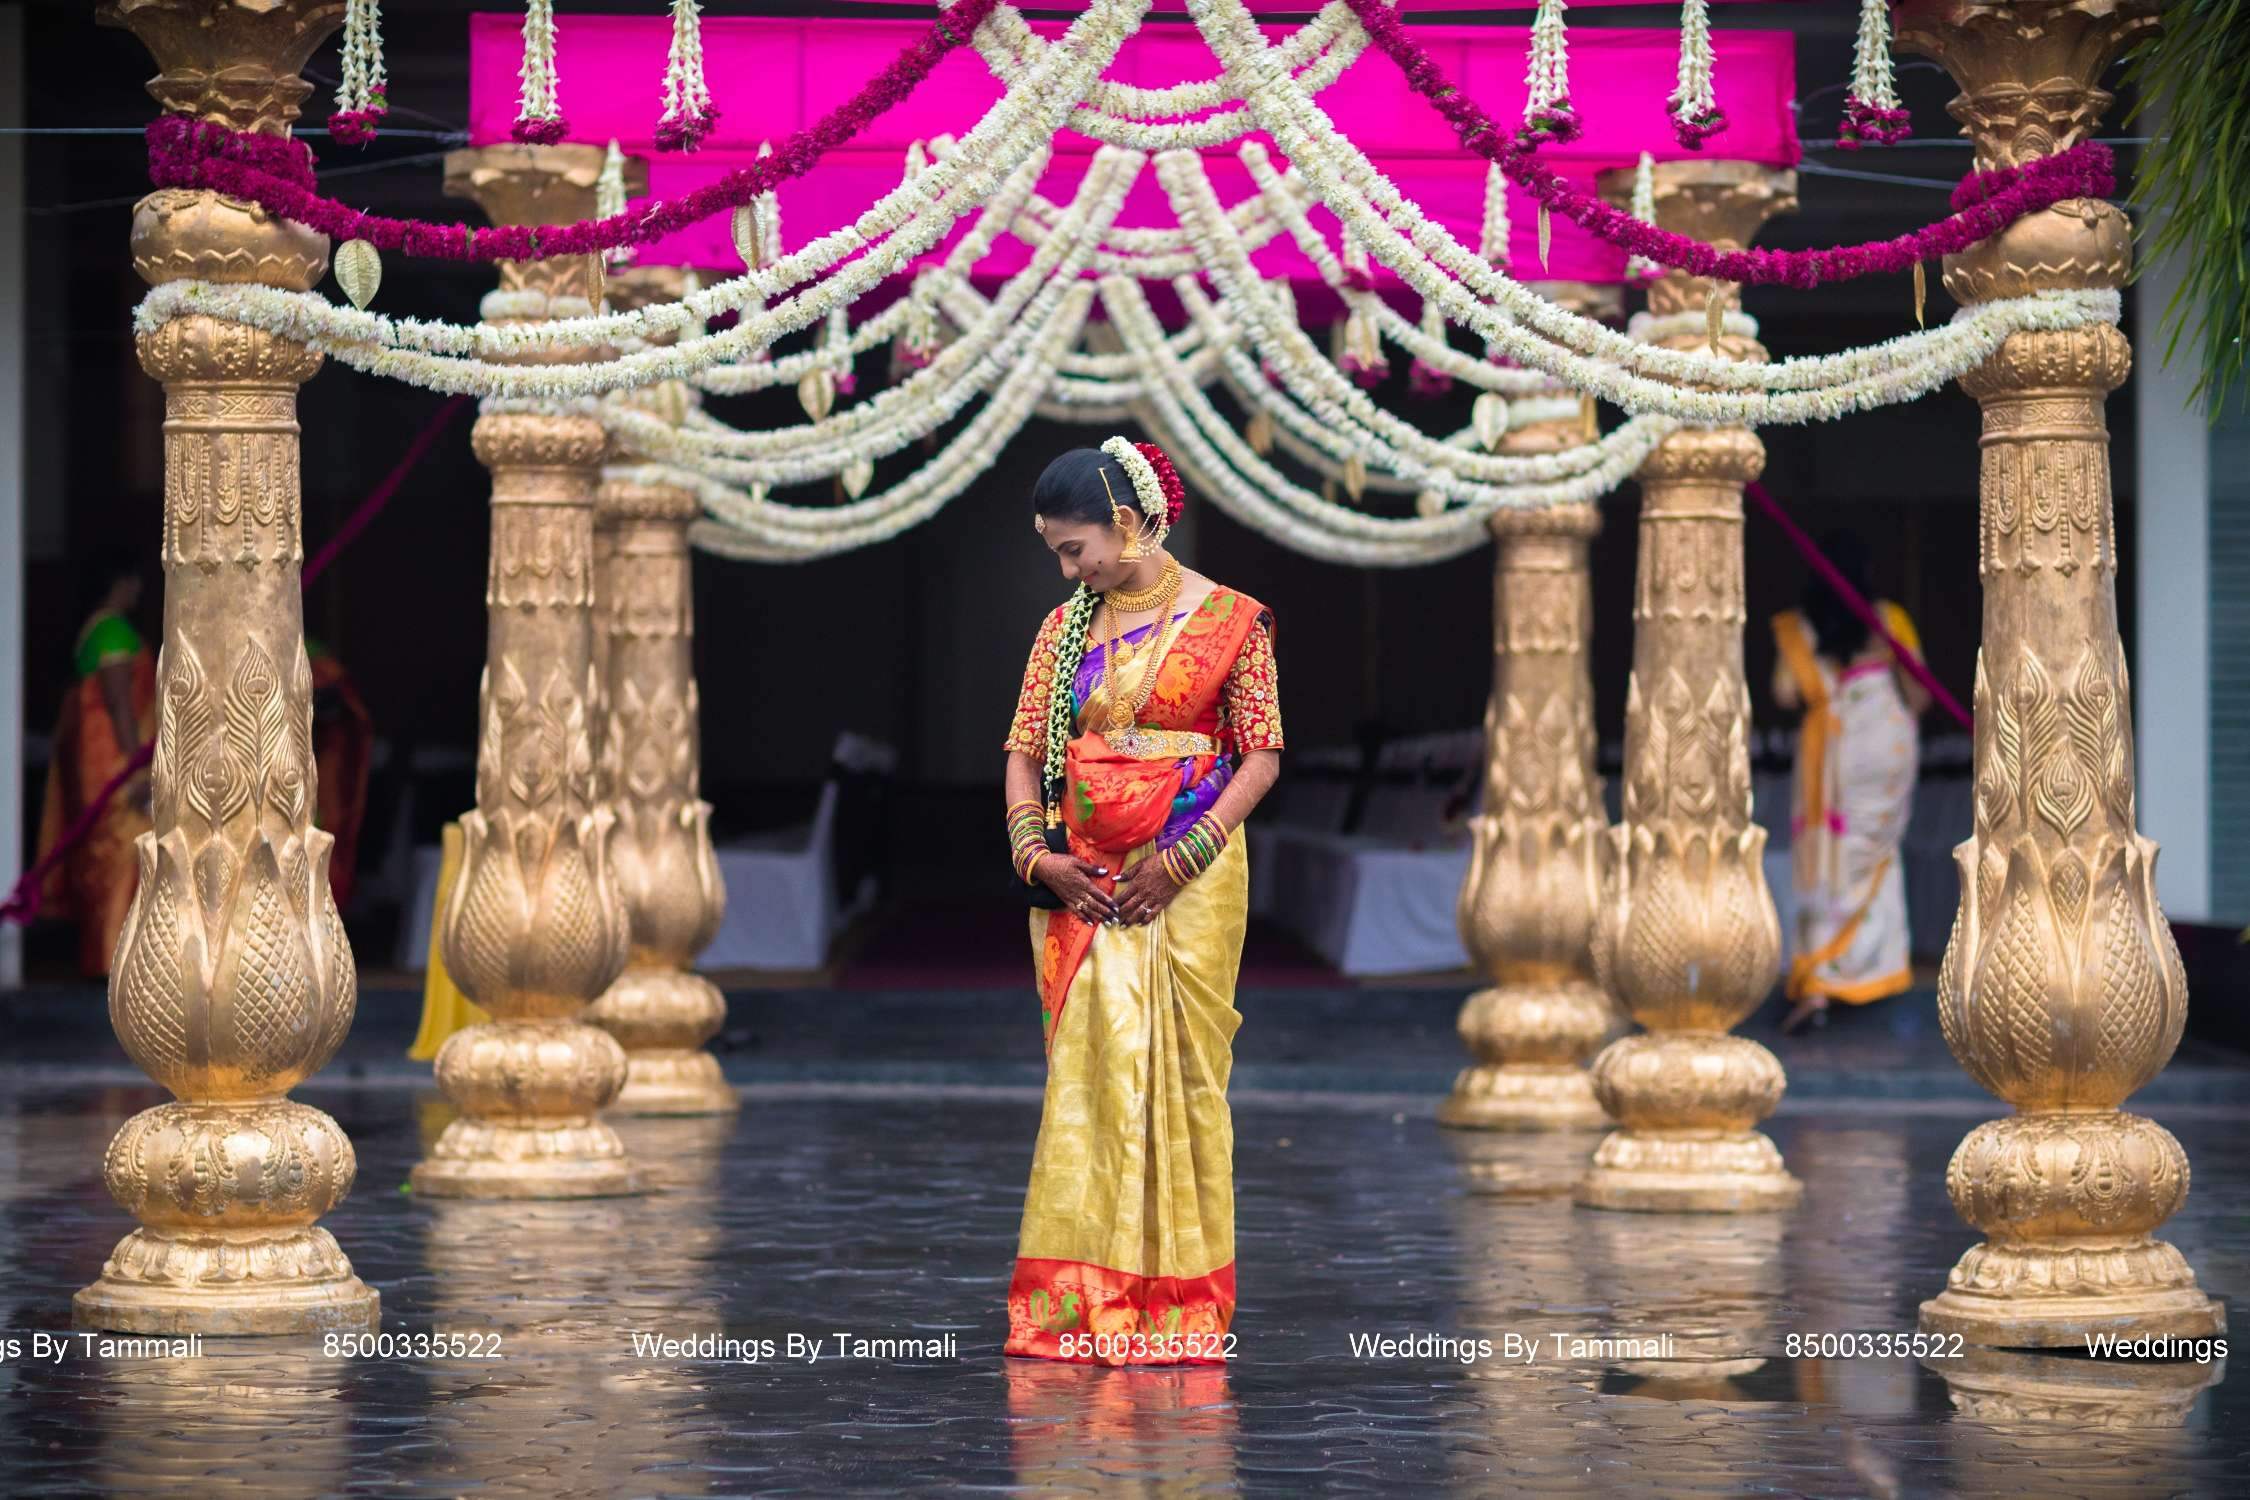 Weddings By Tammali - Portfolio